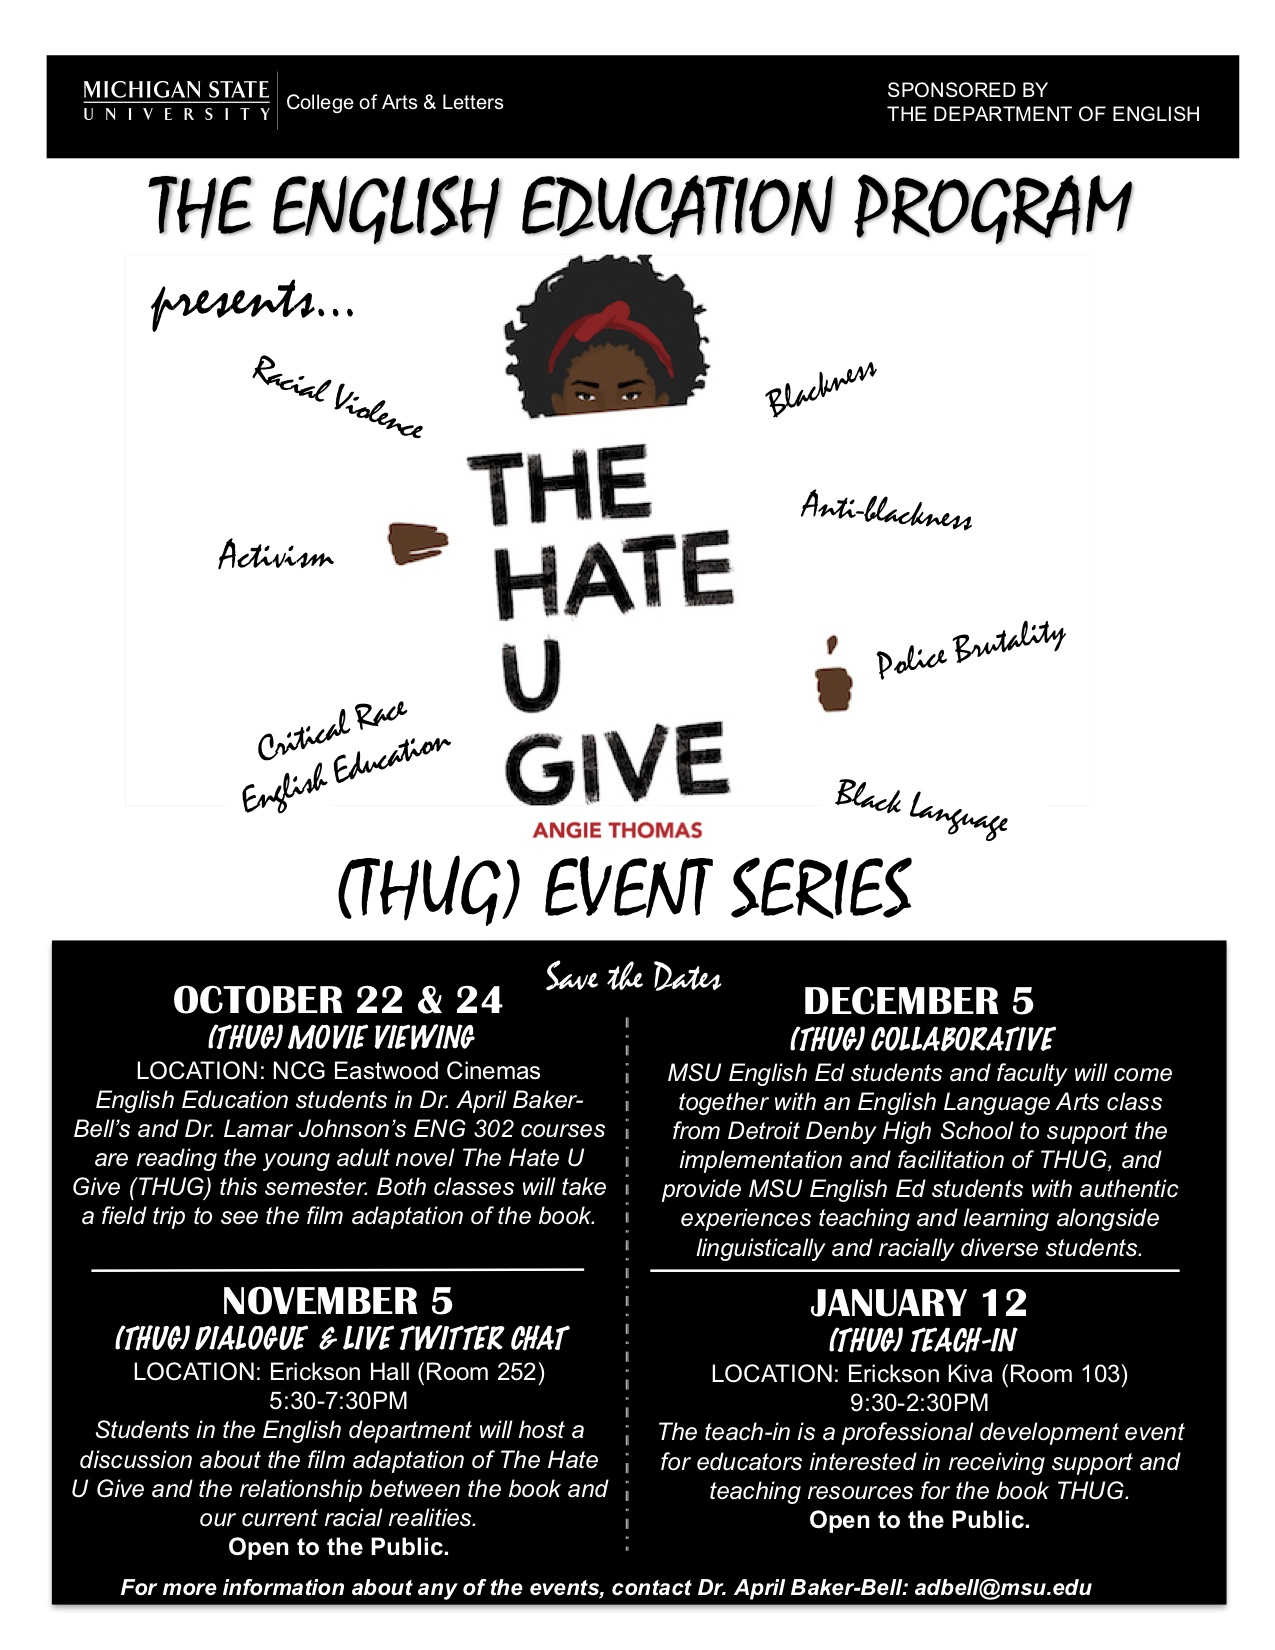 The English Education Program (THUG) Teach-In @ Erickson Kiva (Room 103) | East Lansing | Michigan | United States